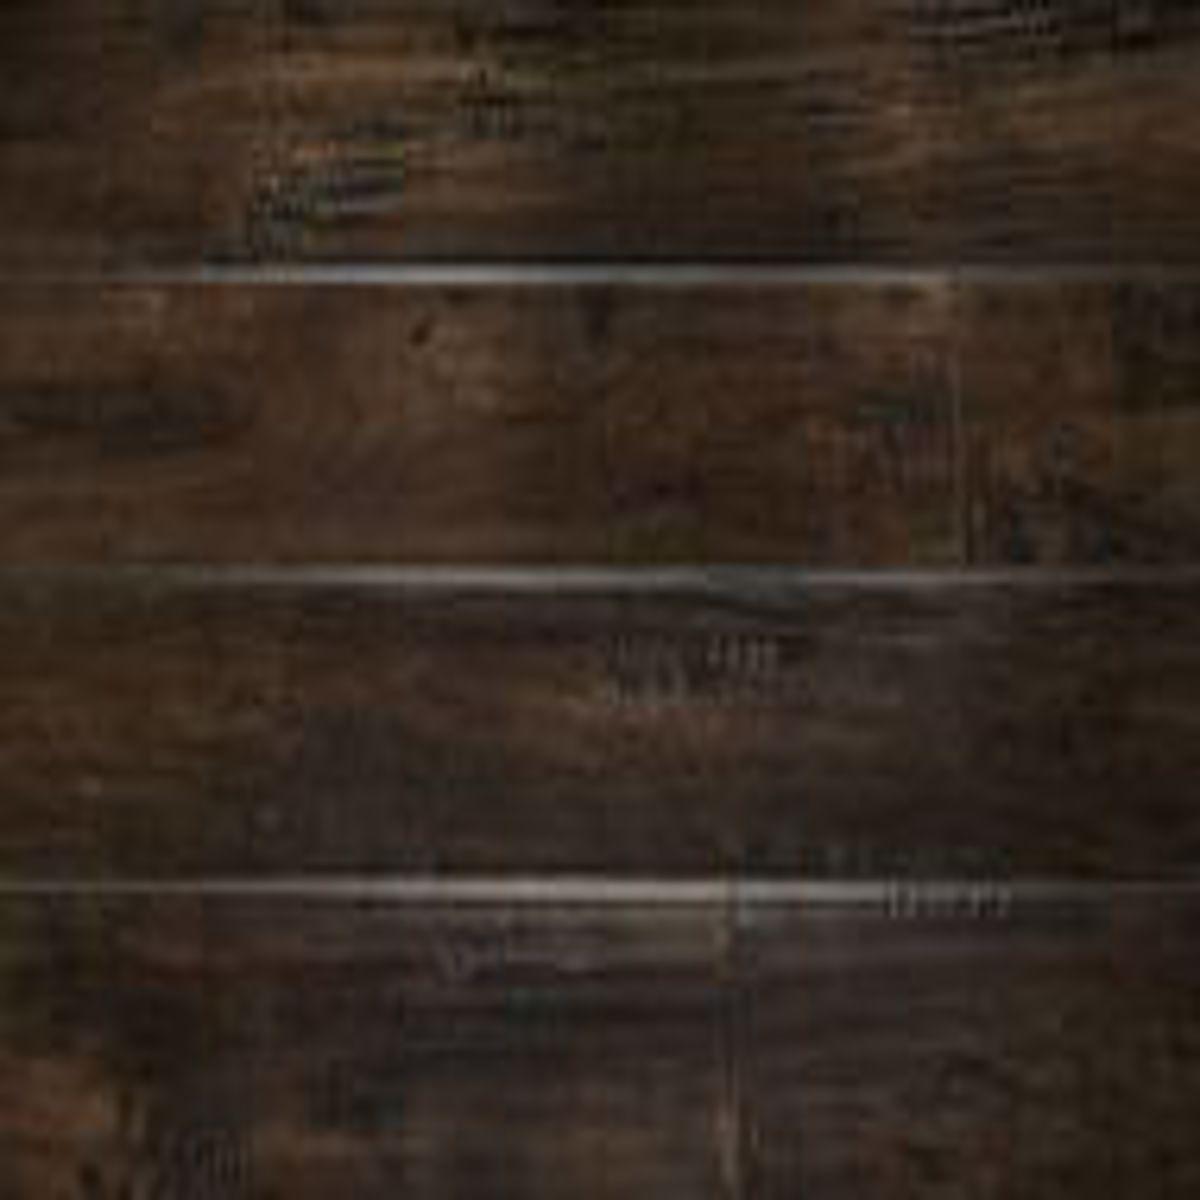 Infiniti Dark Maple Laminate Flooring, Can Laminate Flooring Be Stained Darker